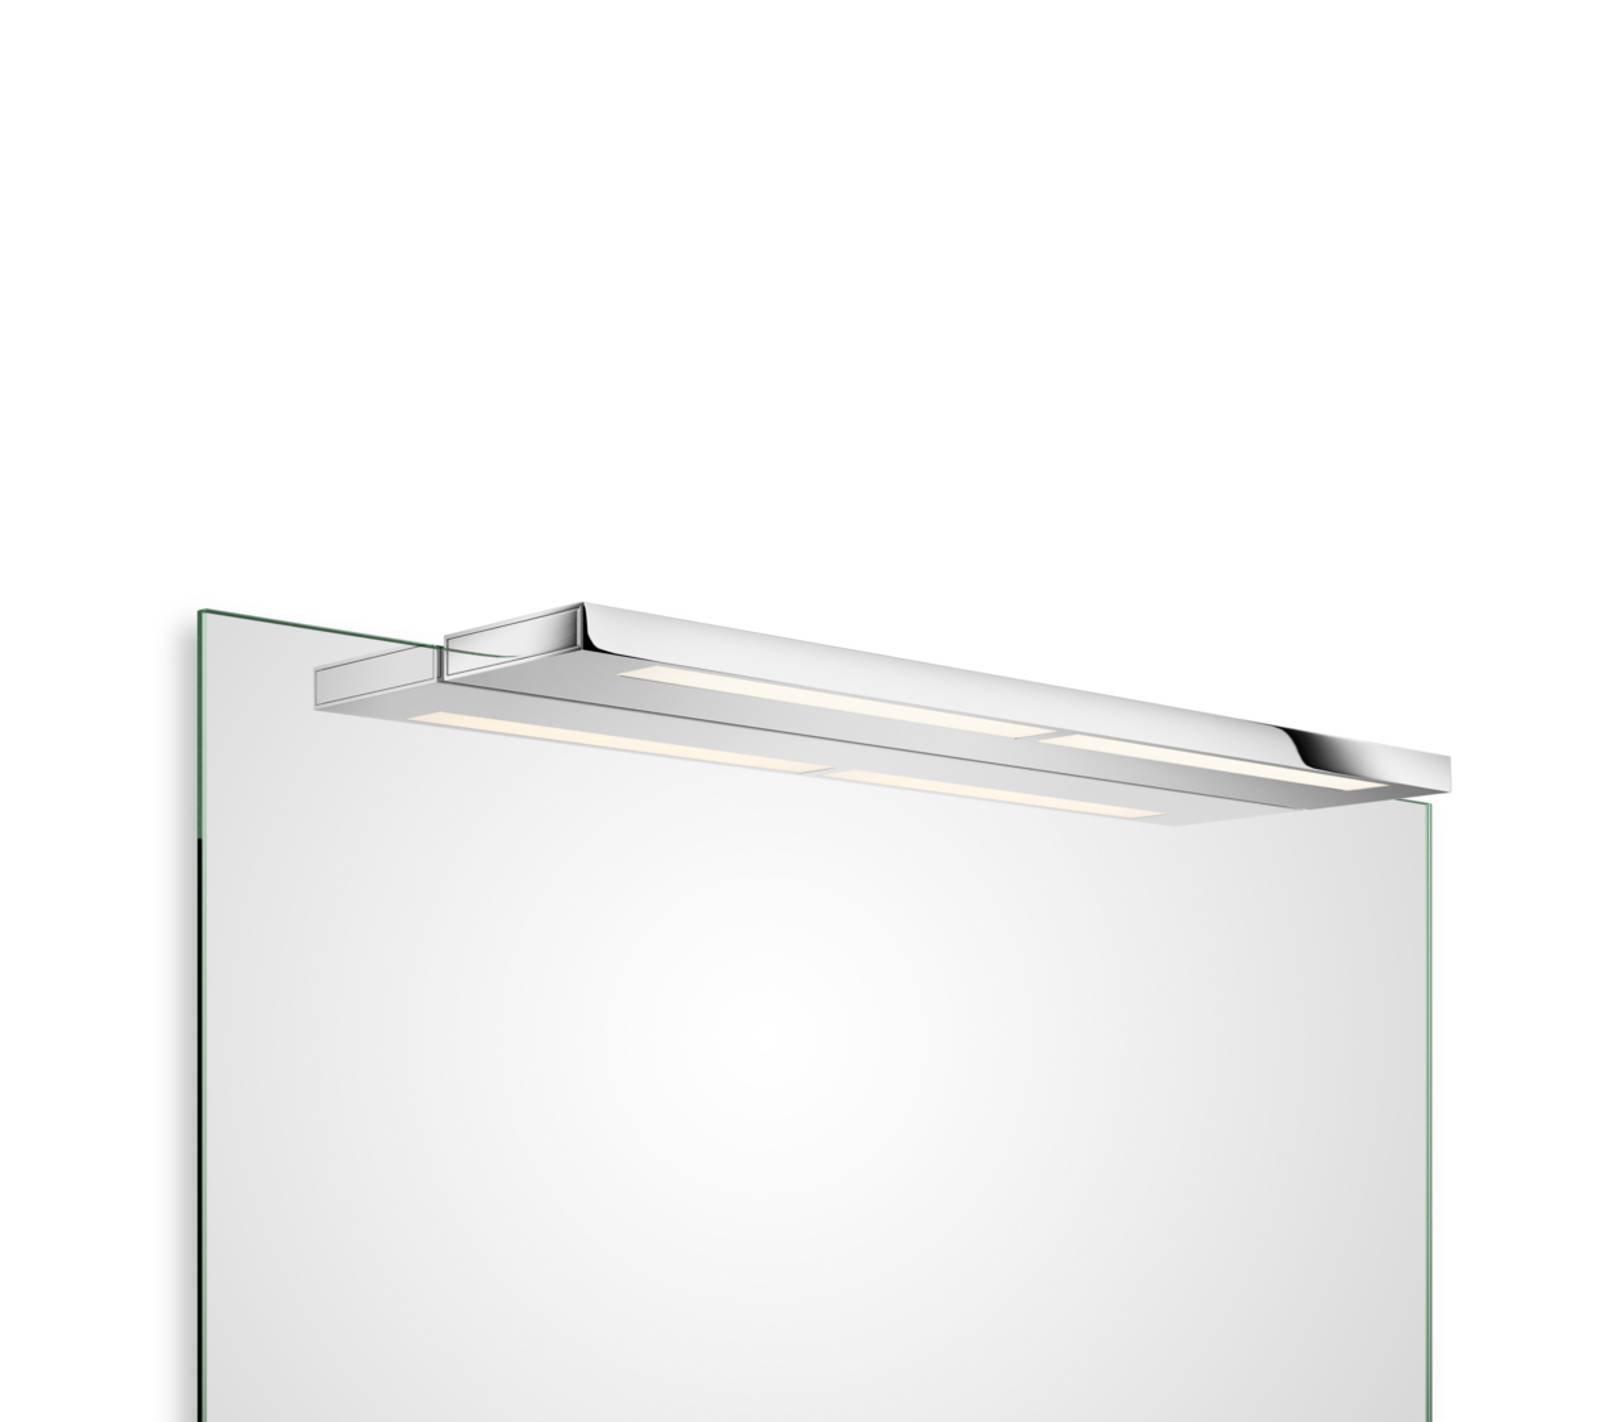 Decor Walther Slim LED-speillampe krom 60 cm